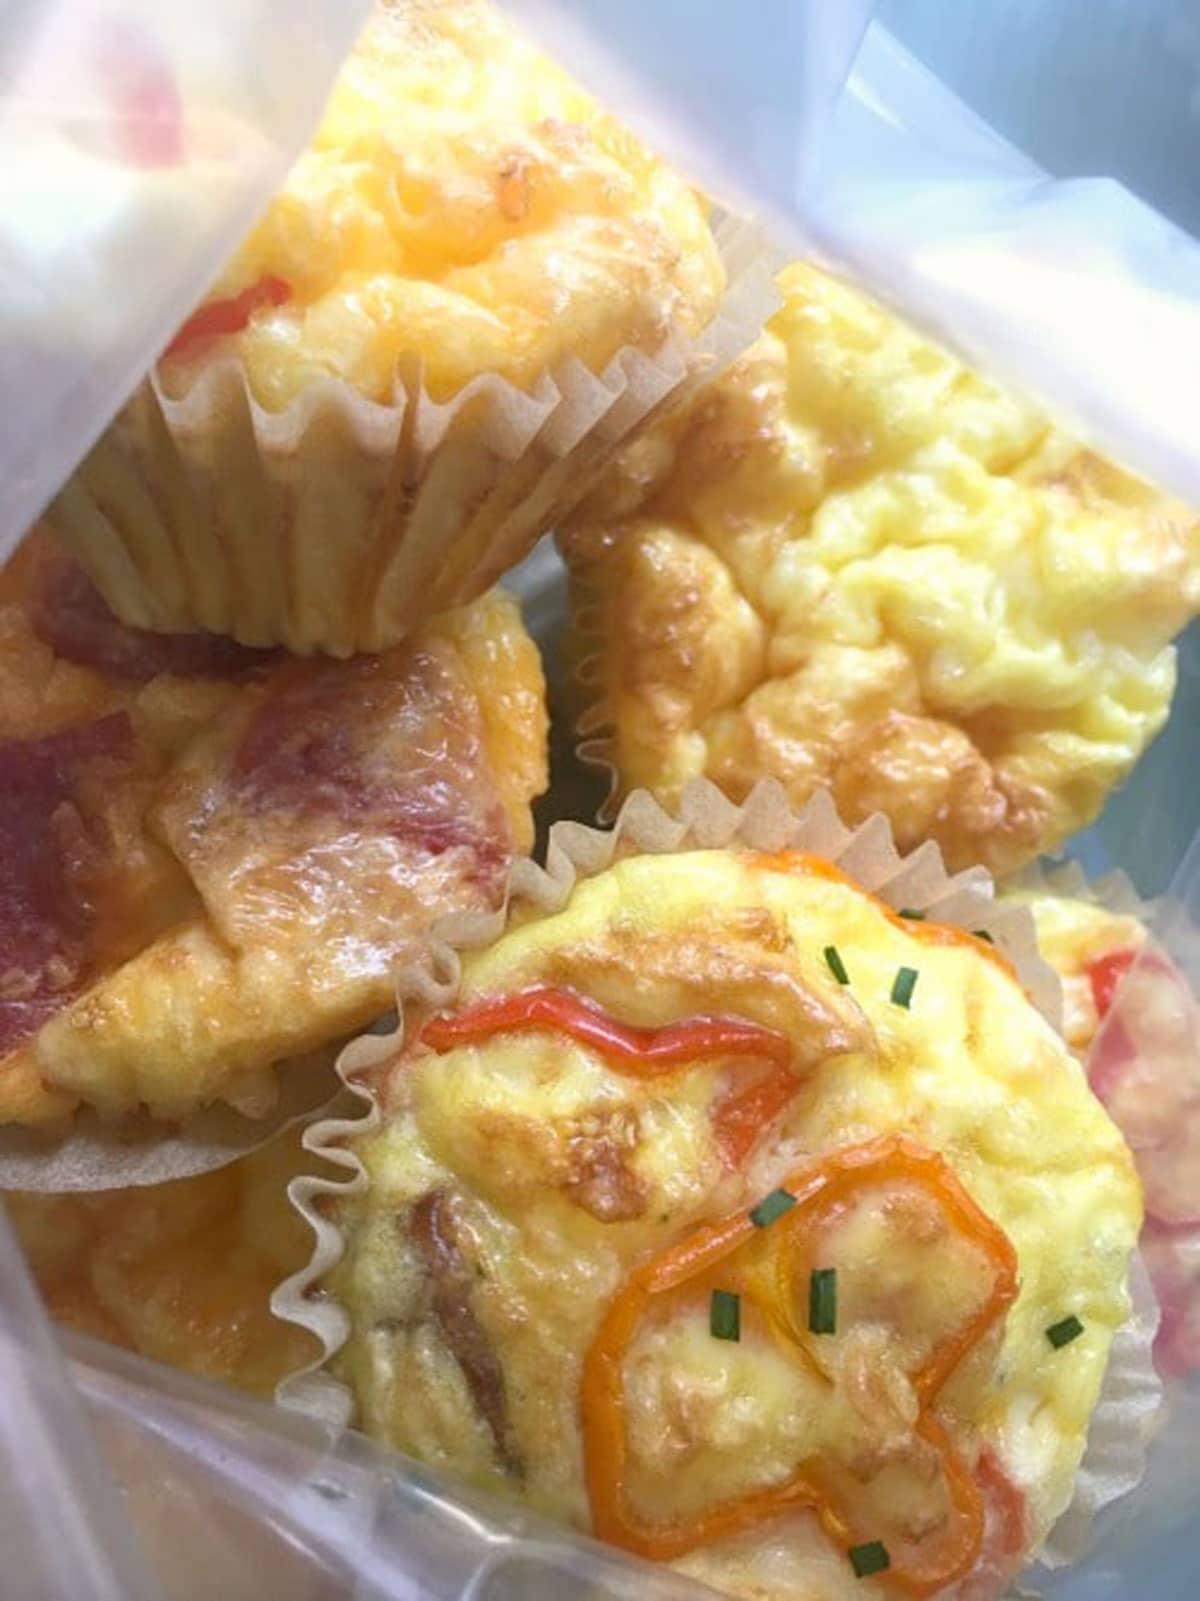 egg muffins in a ziplock freezer bag